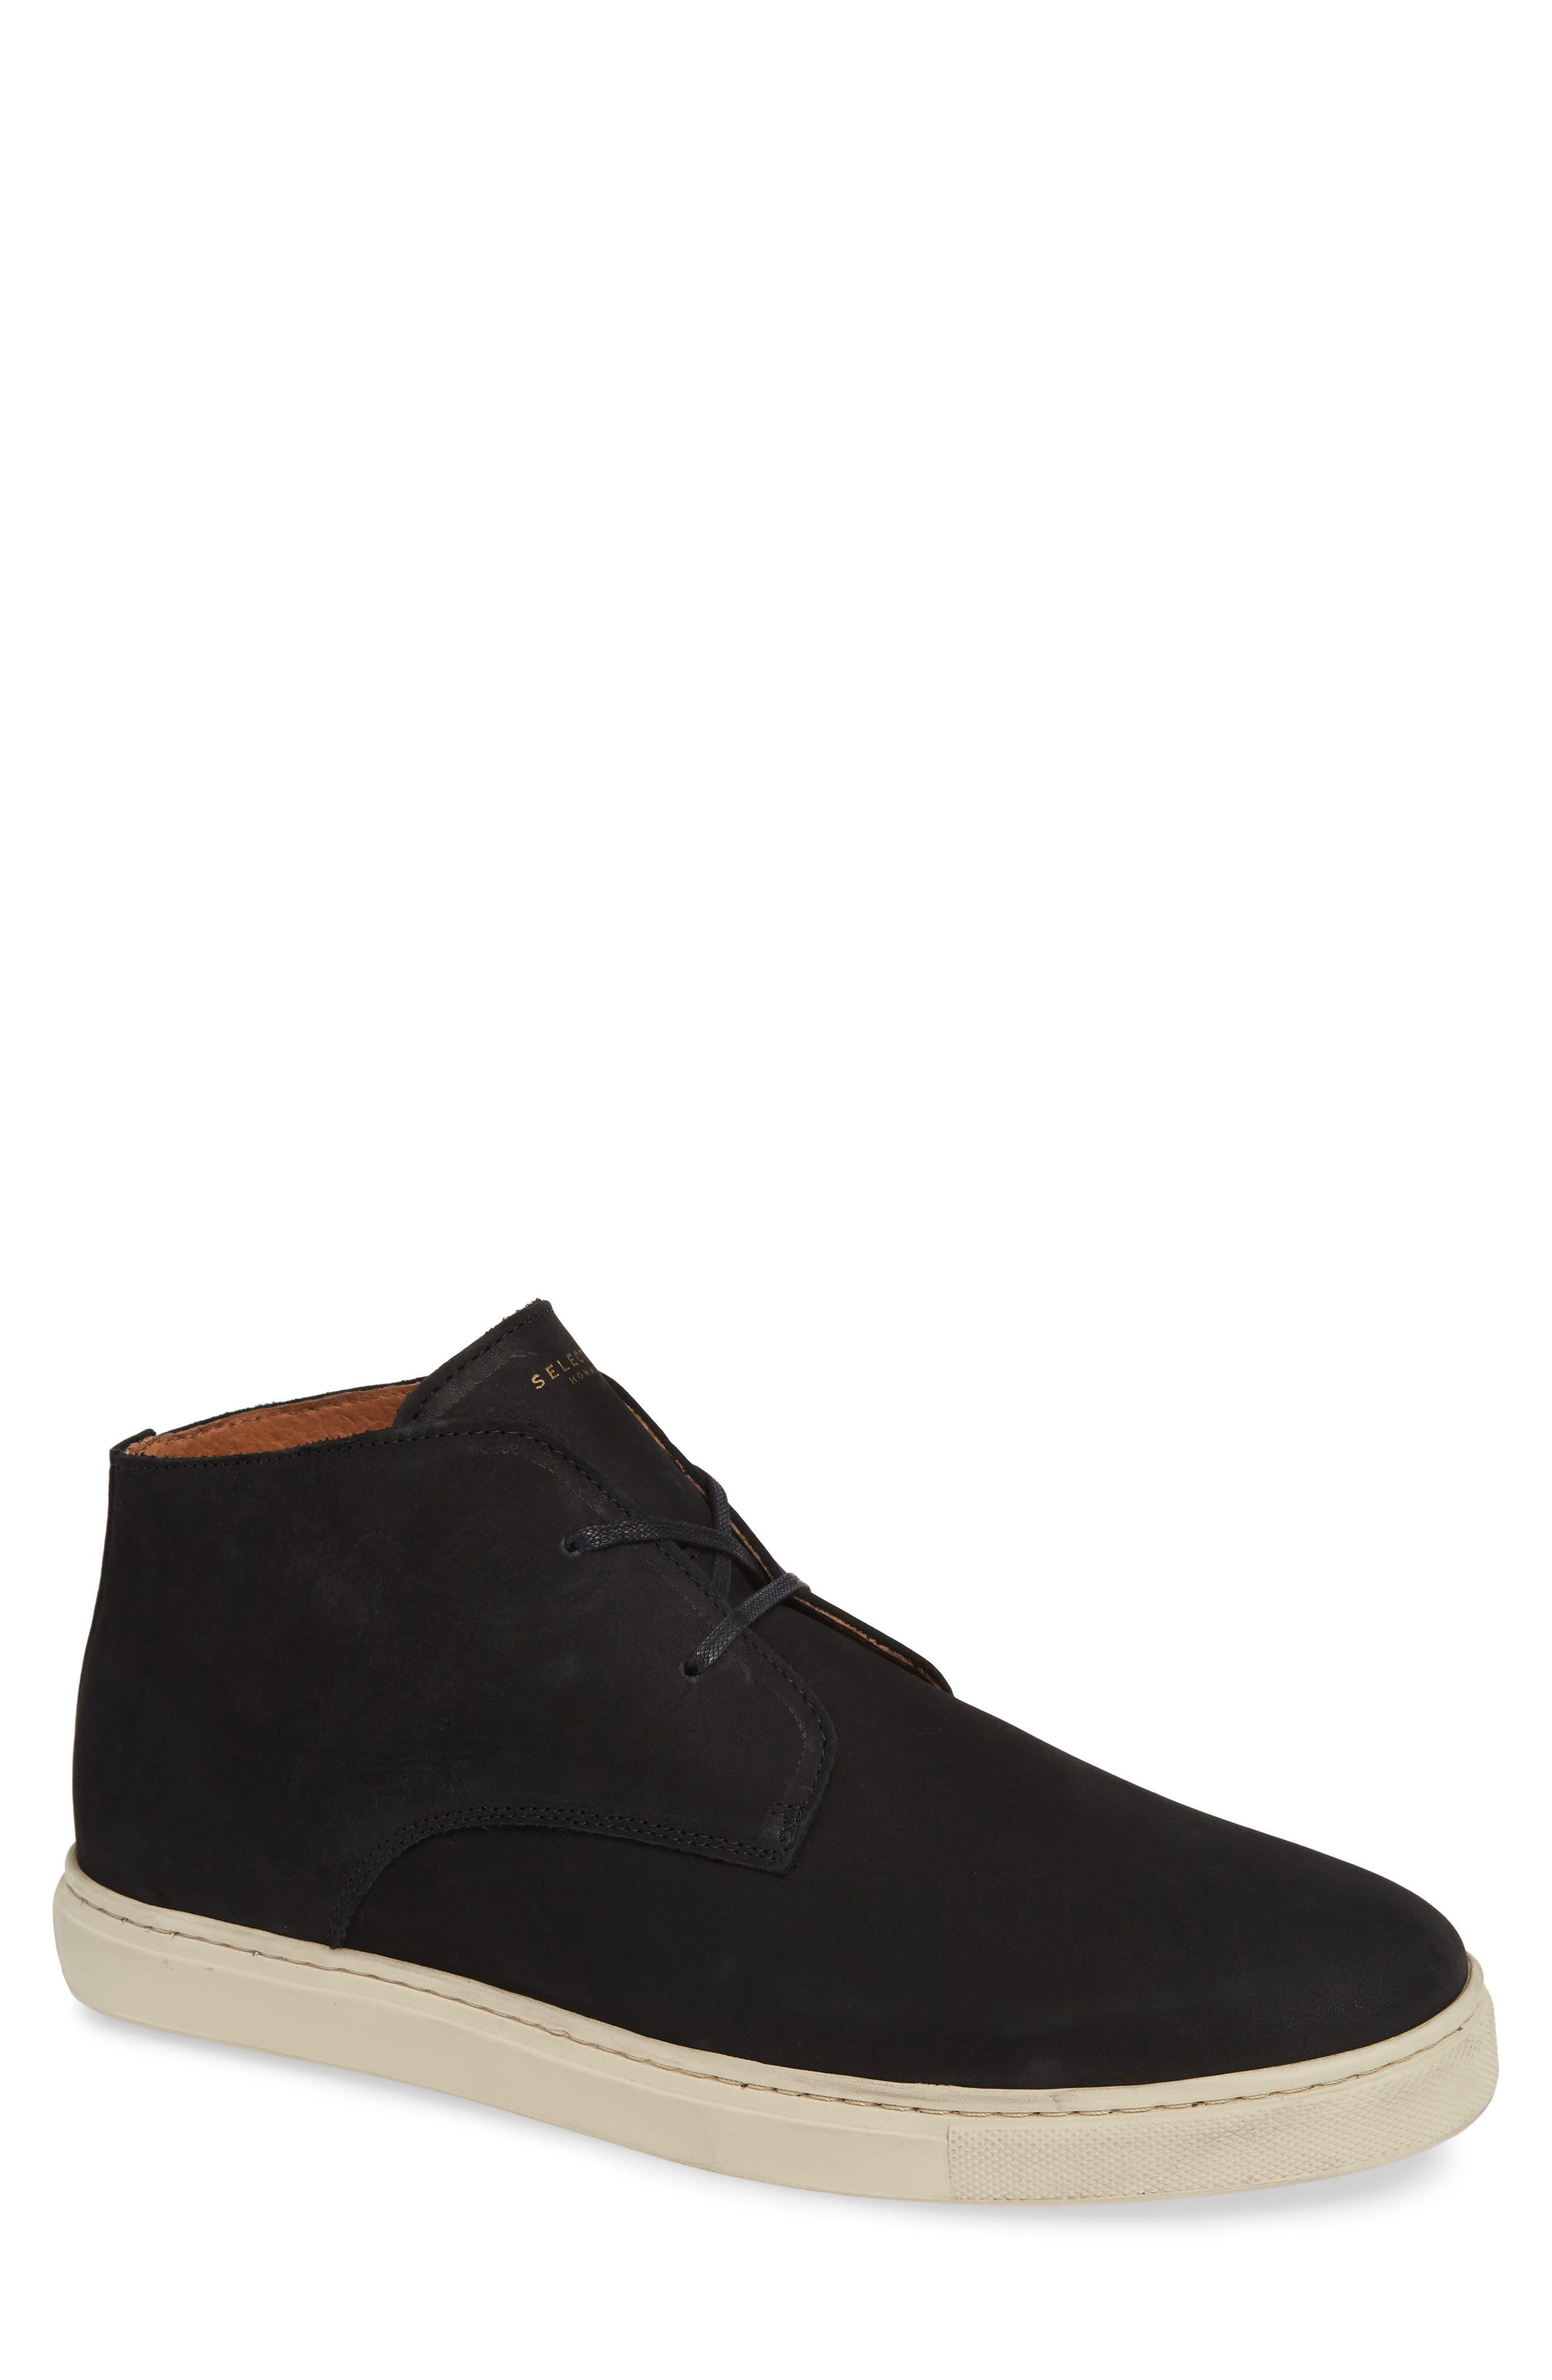 Dempsey Chukka Sneaker,                         Main,                         color, BLACK